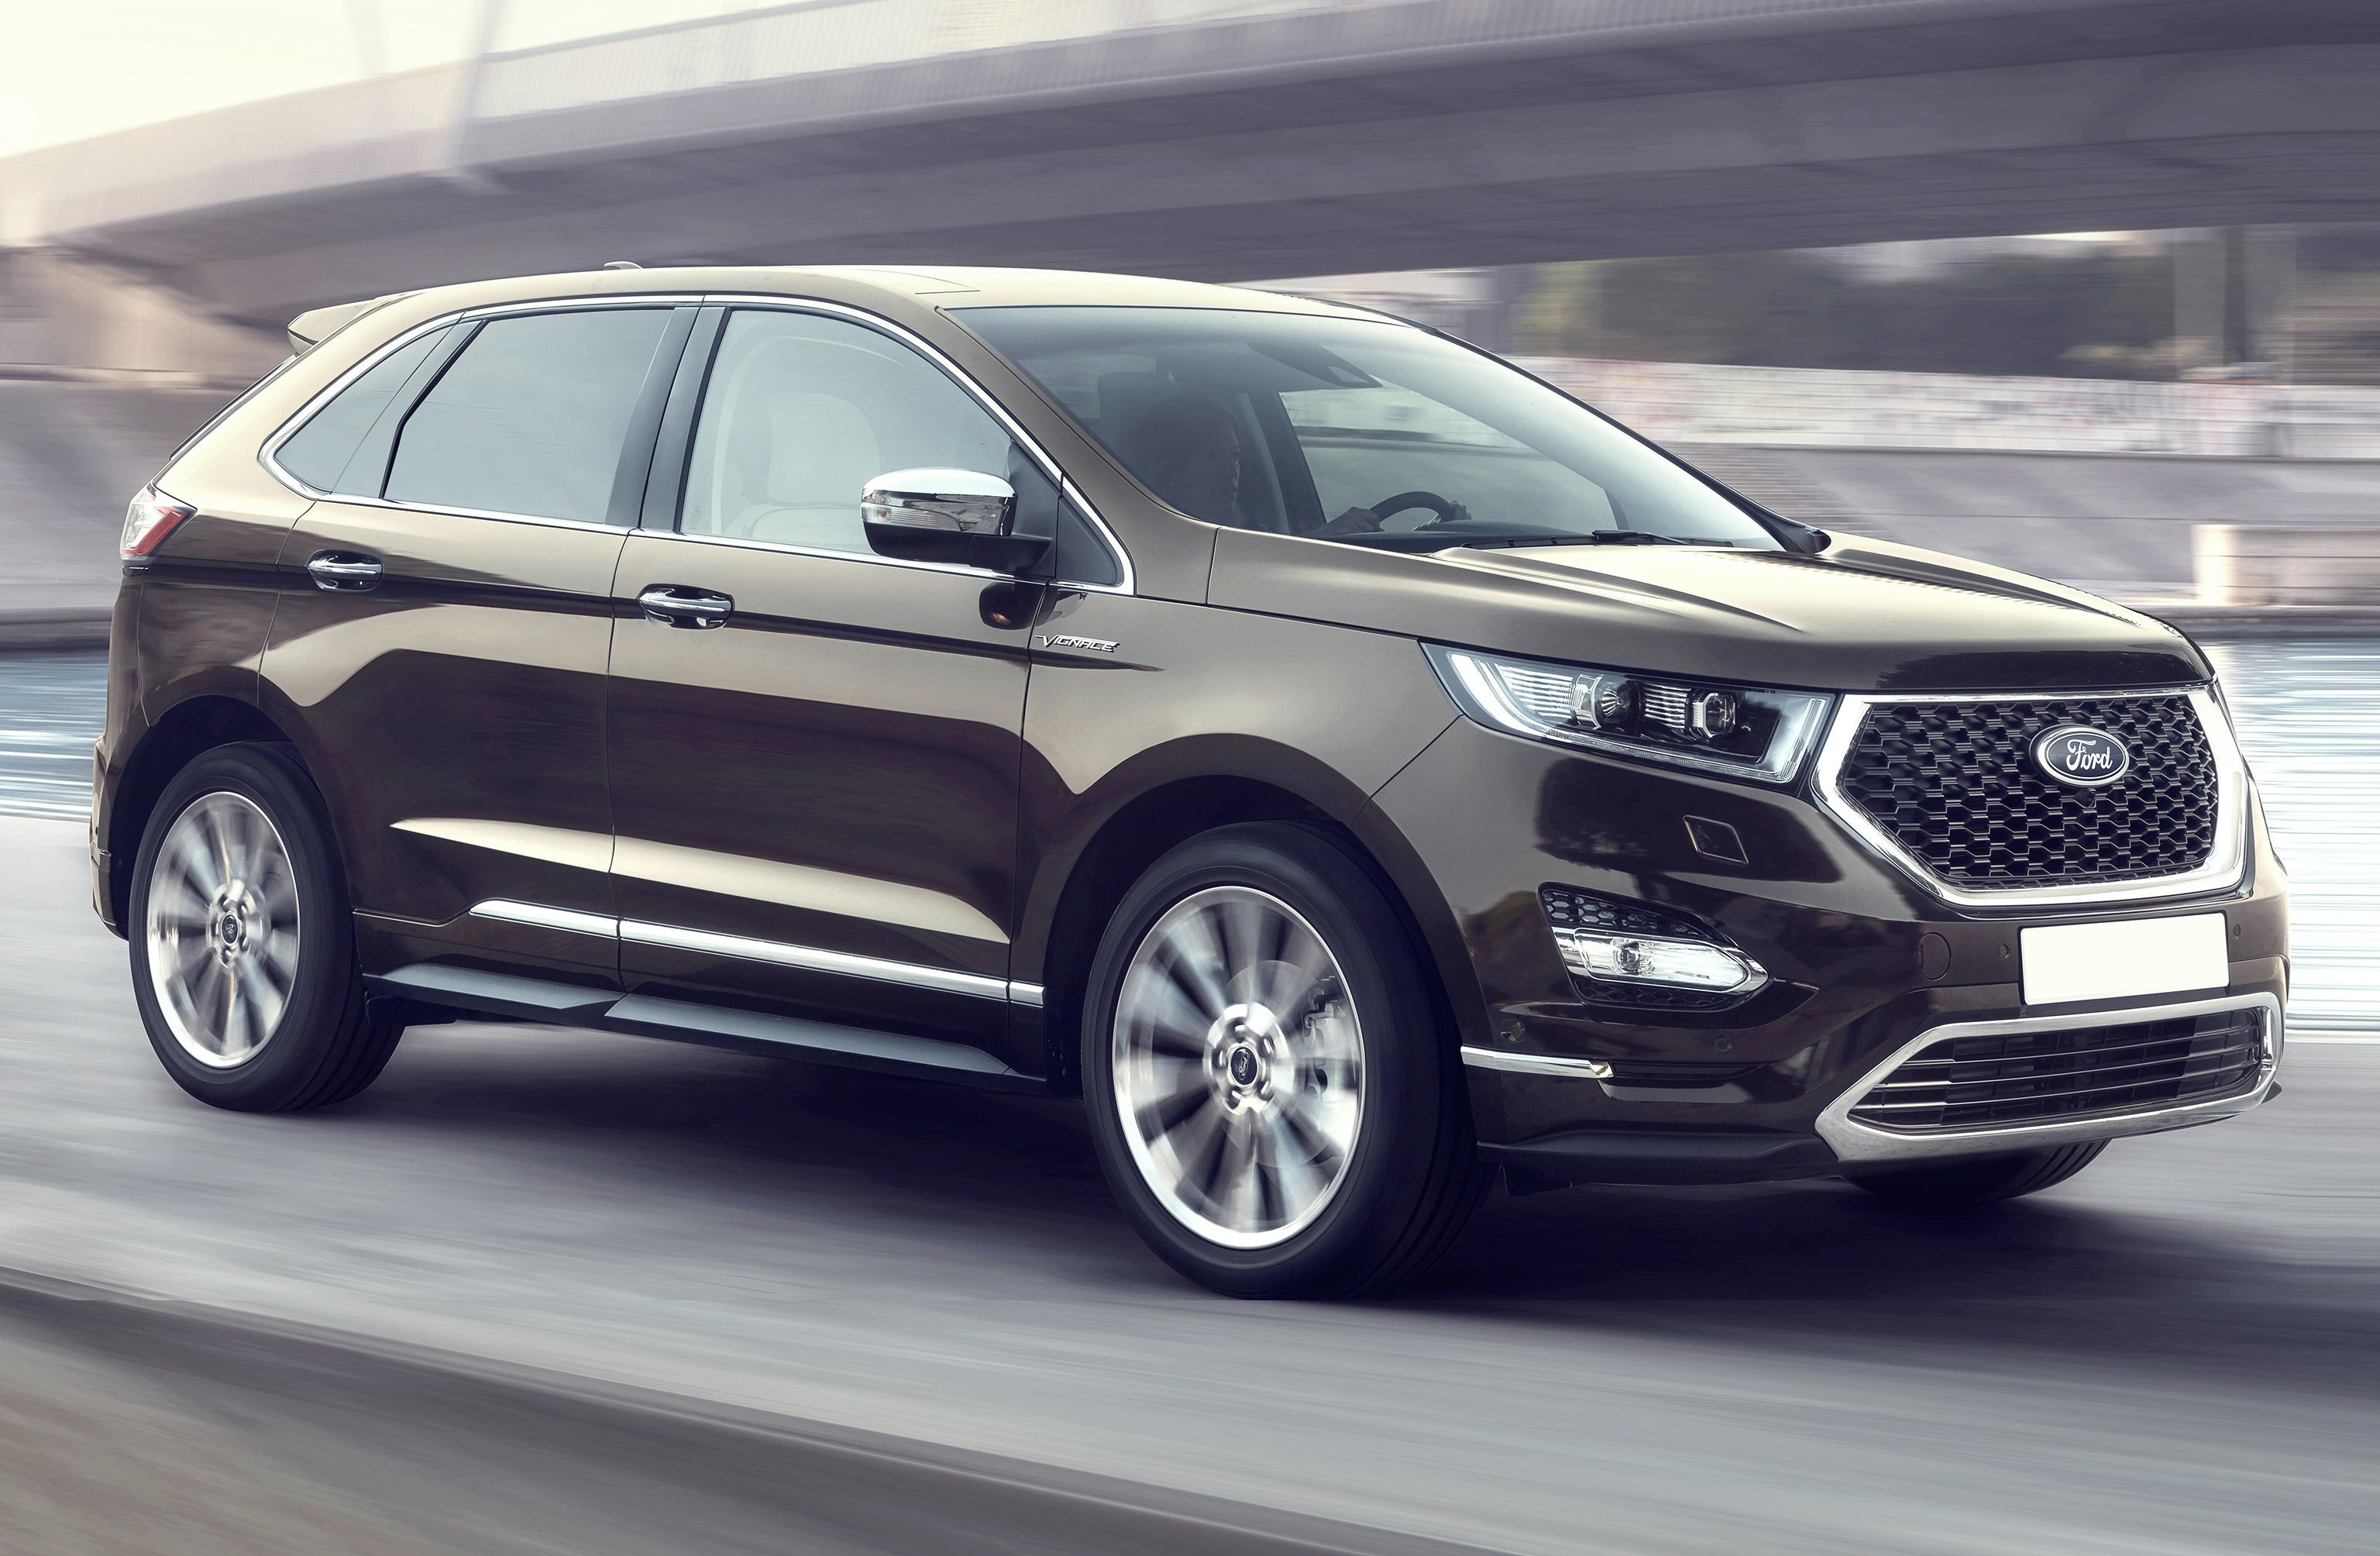 AVG. SAVING £4600. 5.9. Ford & Ford Car Reviews | carwow markmcfarlin.com